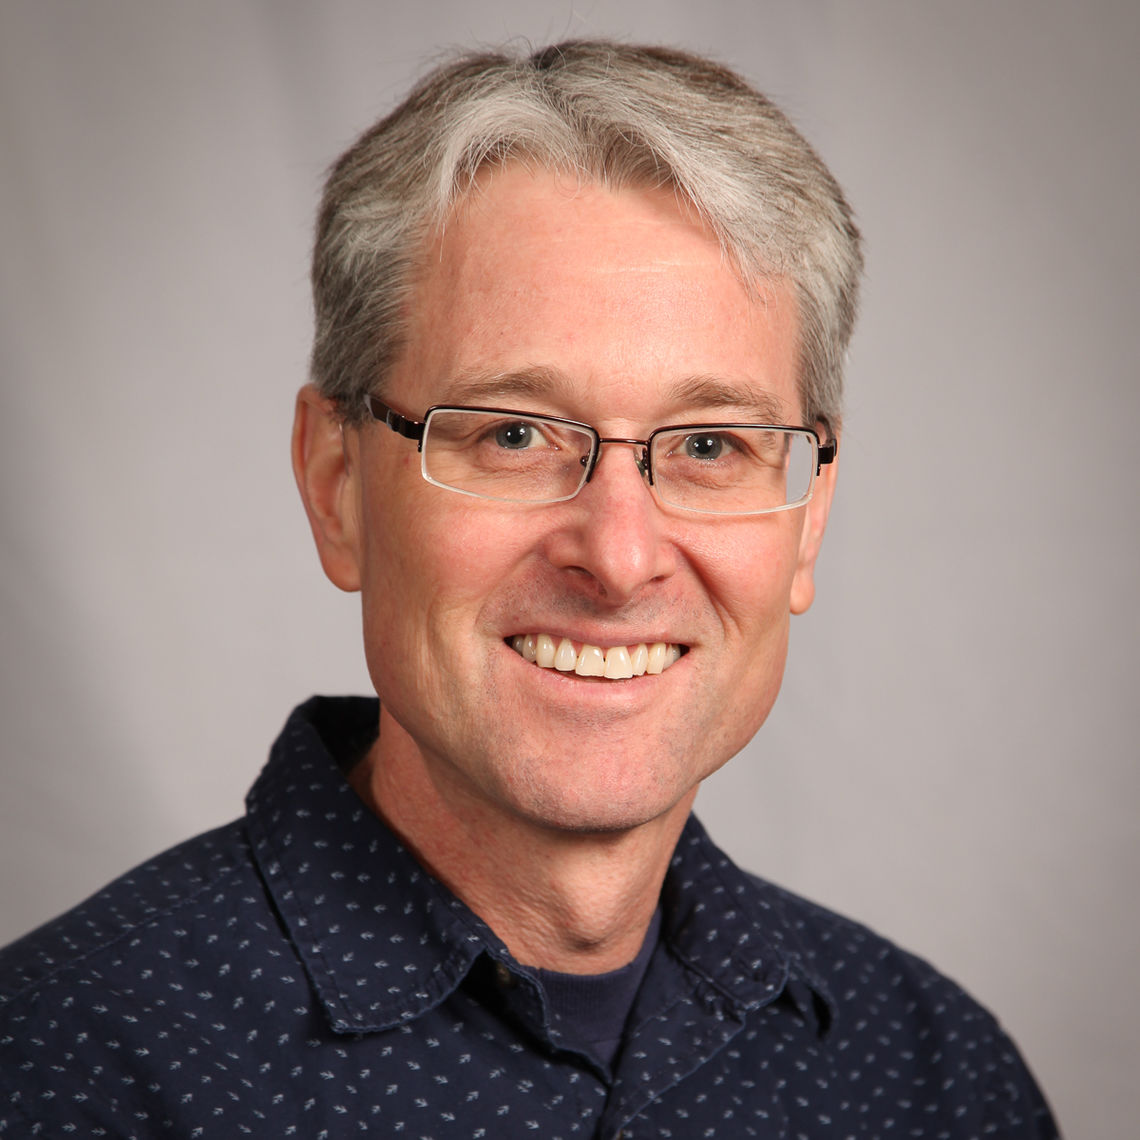 Scott Van Arman